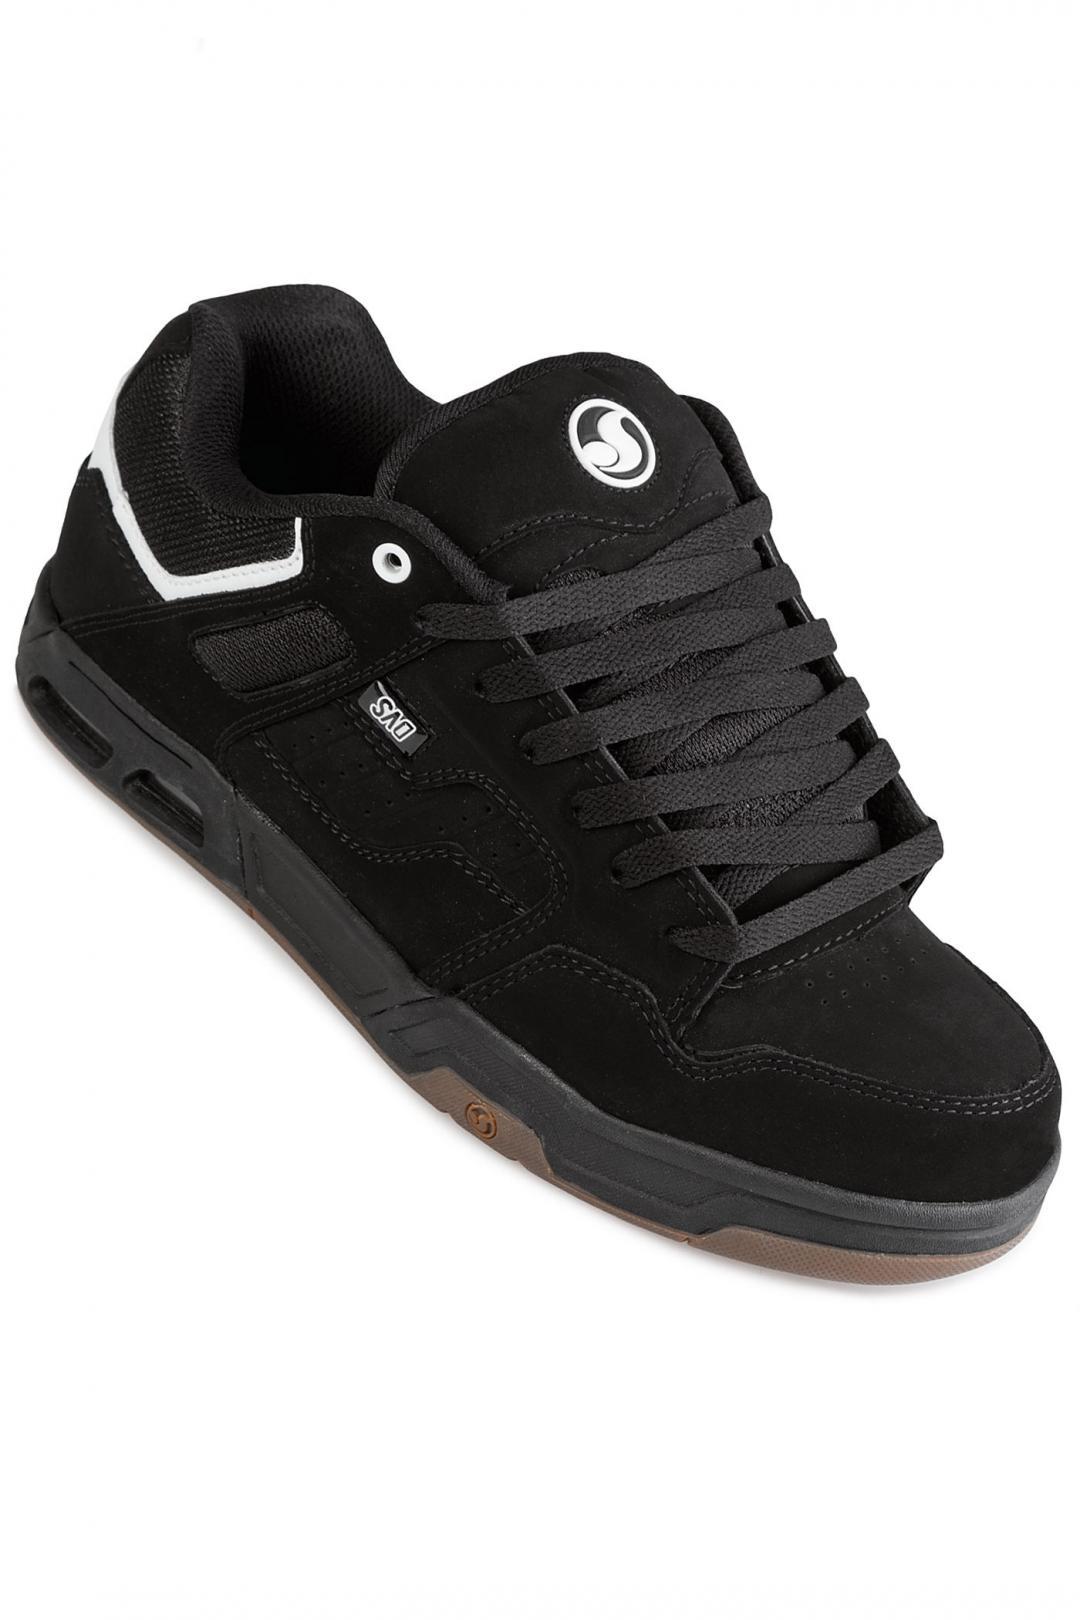 Uomo DVS Enduro Heir black white black | Scarpe da skate